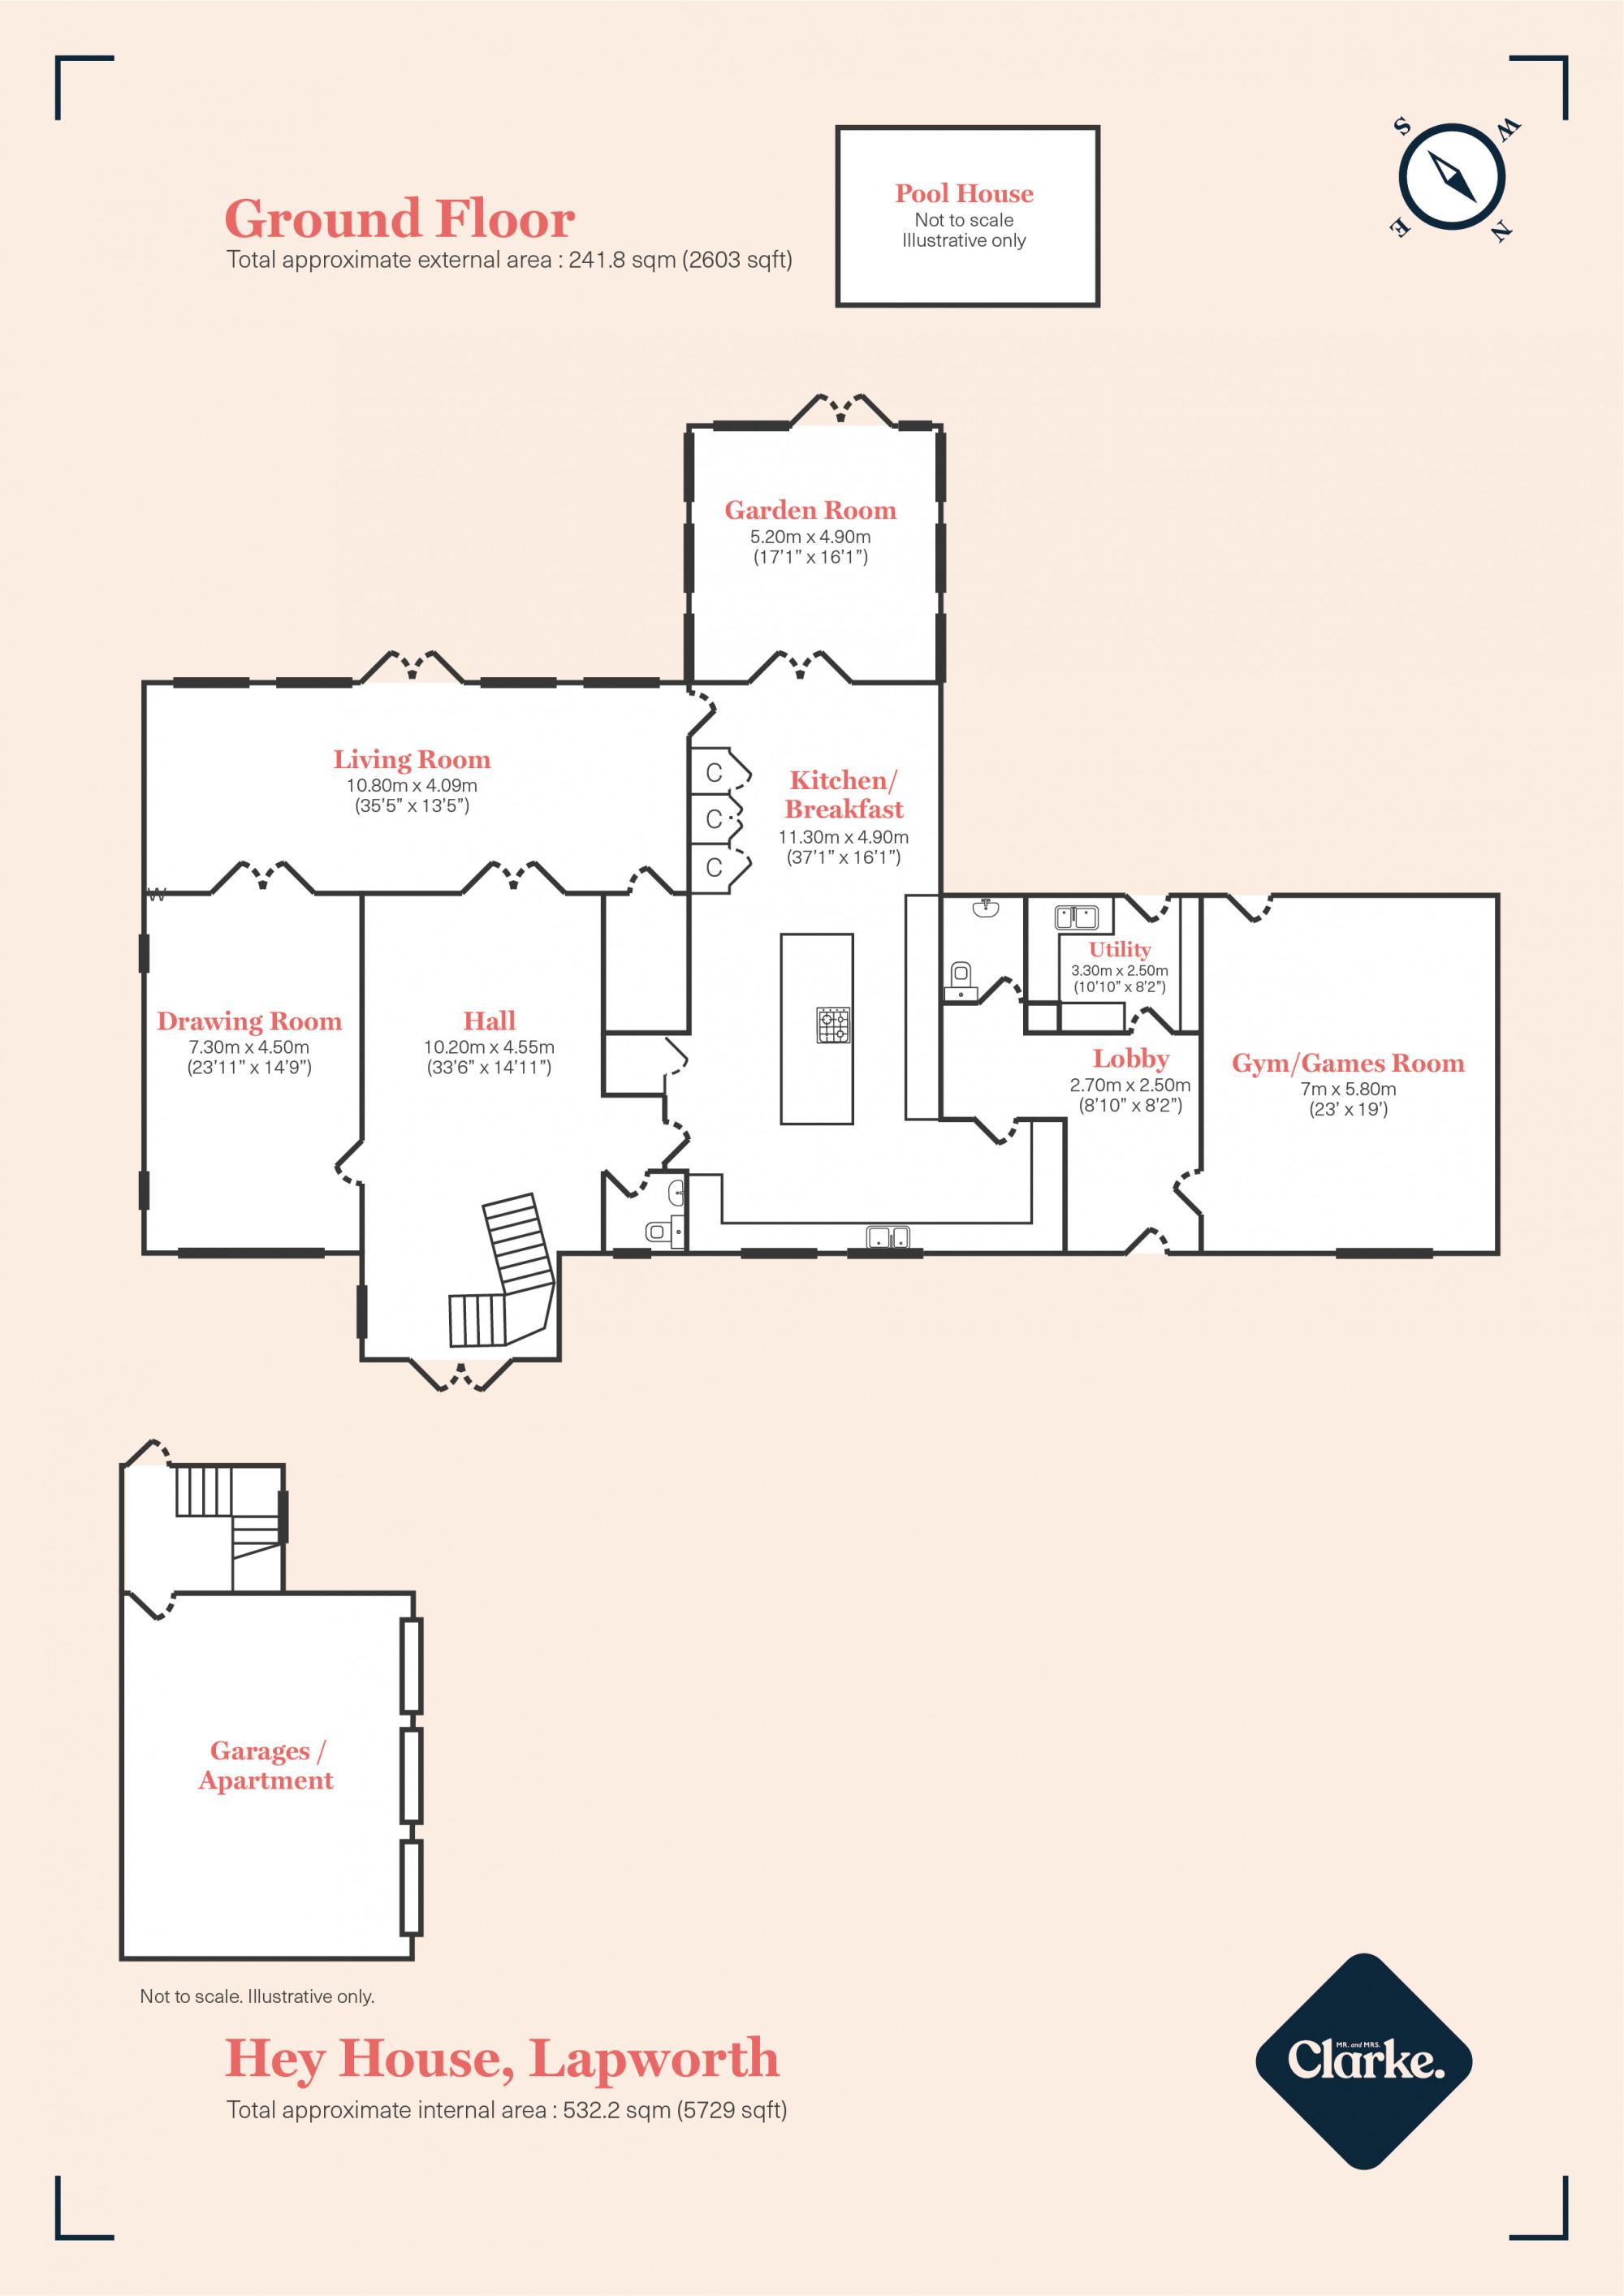 Hey House, Lapworth. Floorplan.